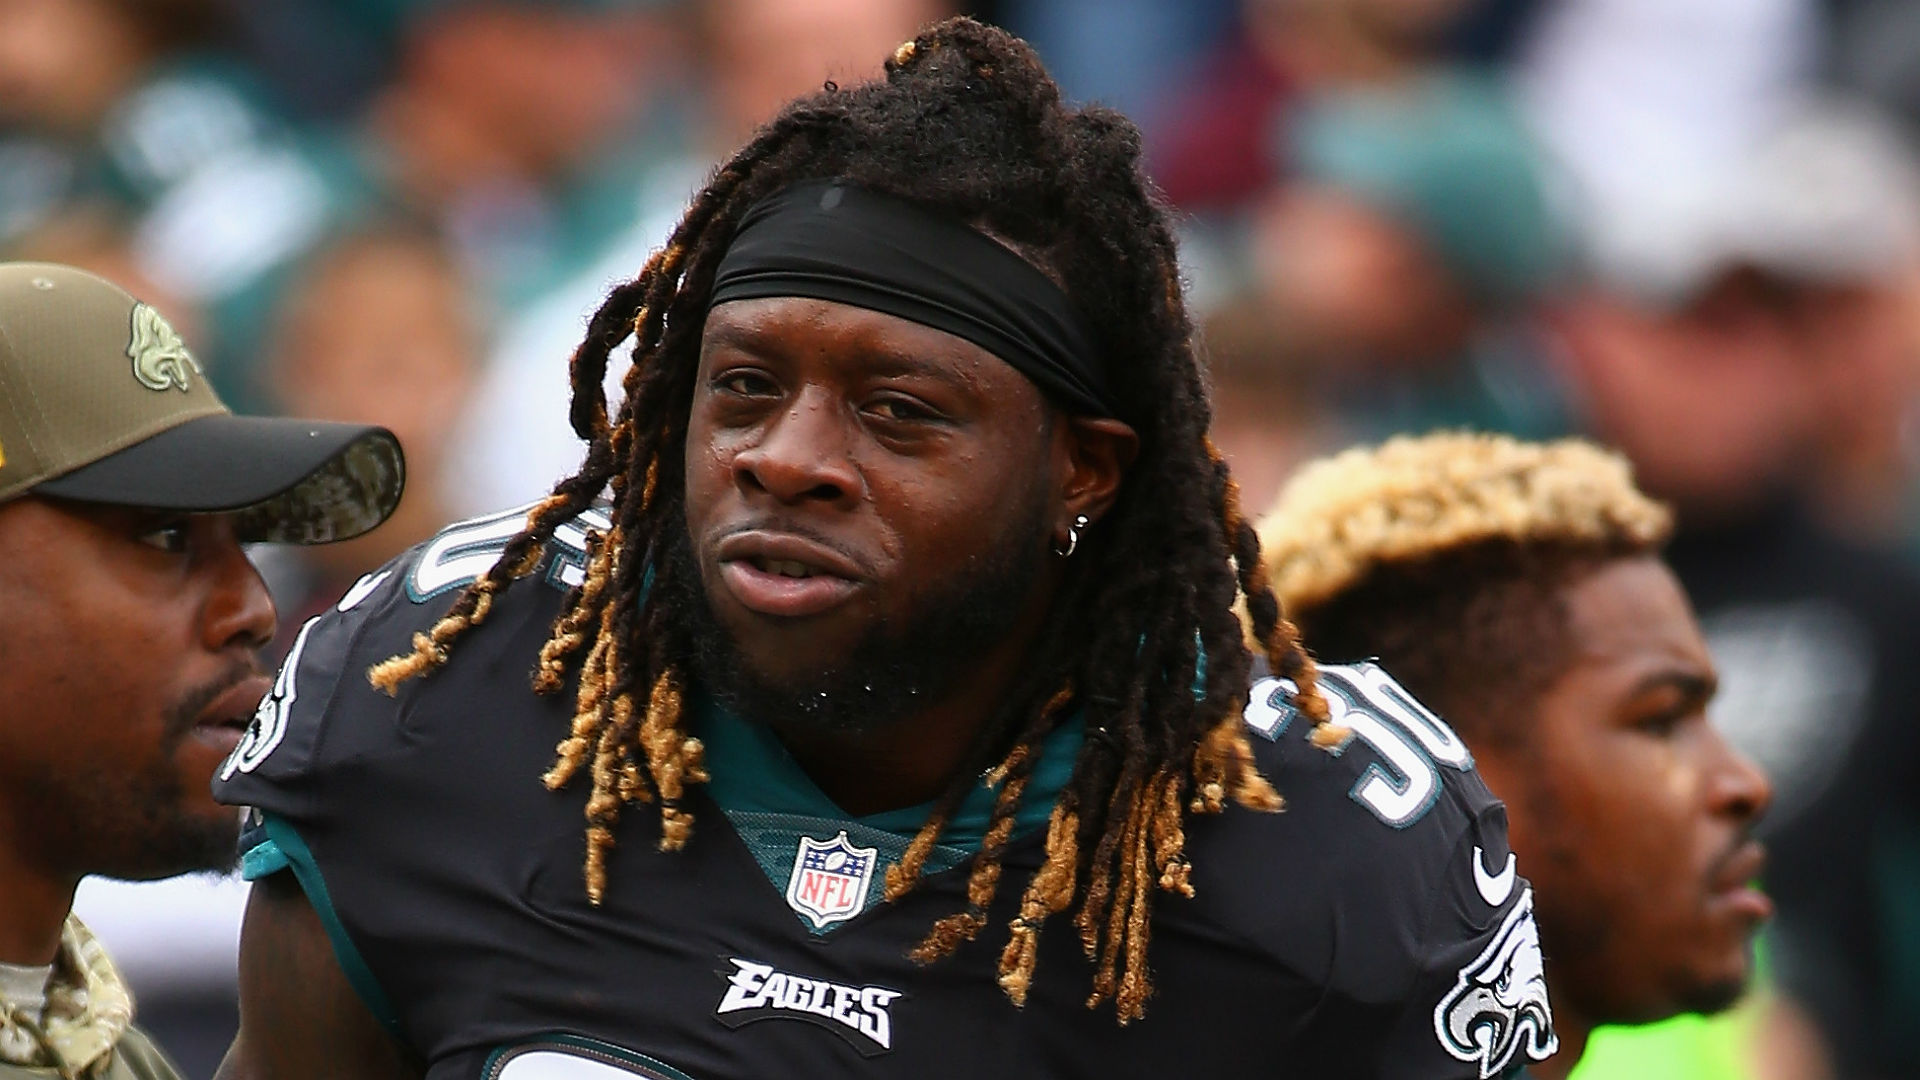 Did Cowboys quit against Eagles? 'Definitely,' Jay Ajayi says